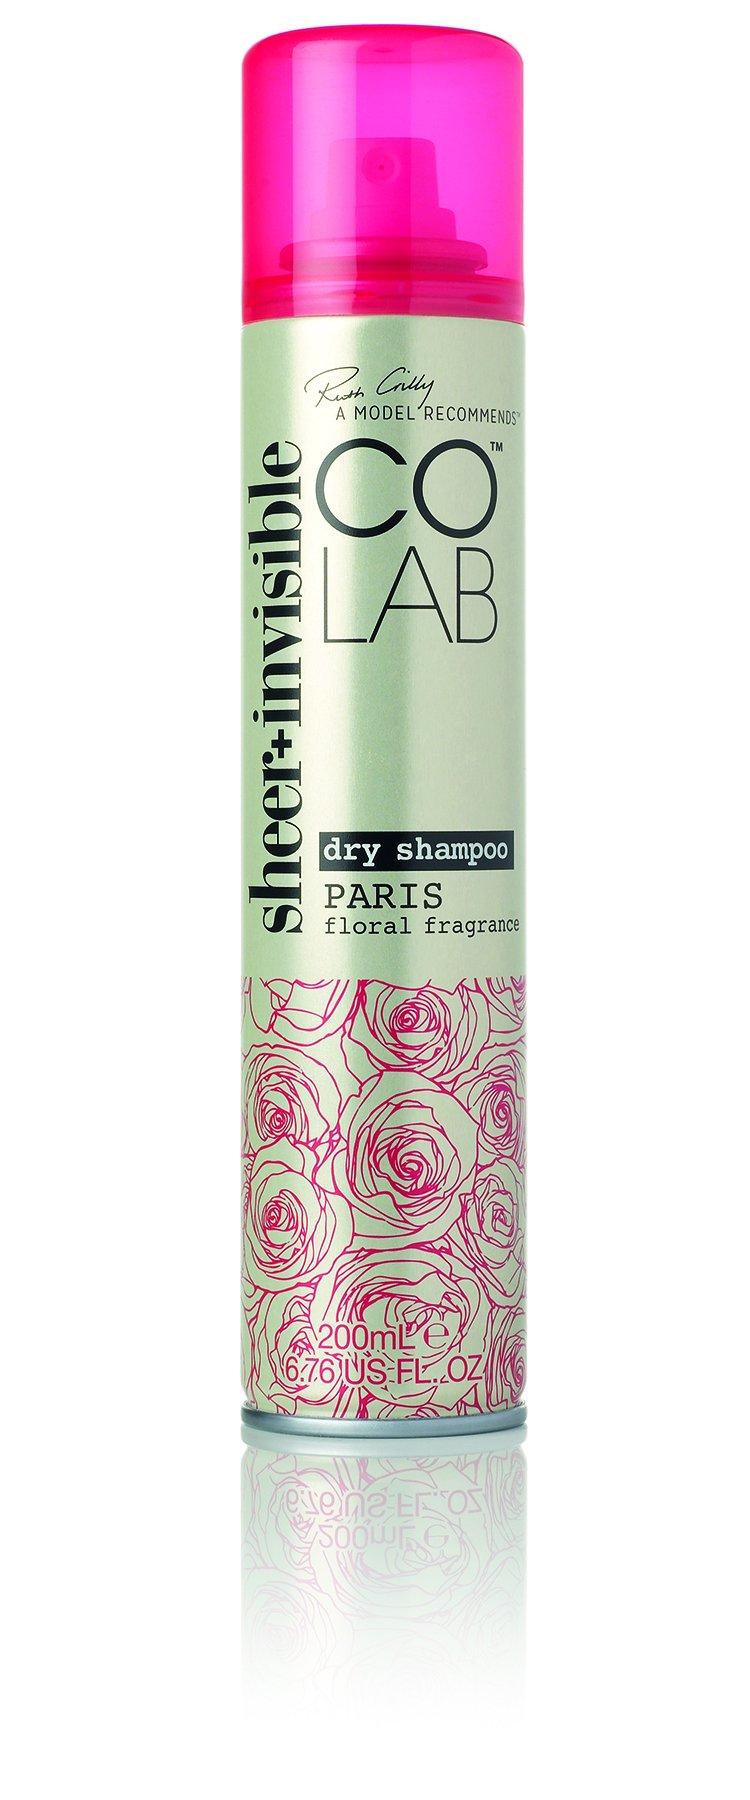 Amazon.com: Colab Sheer + Invisible Dry Shampoo - 6.76 Fl